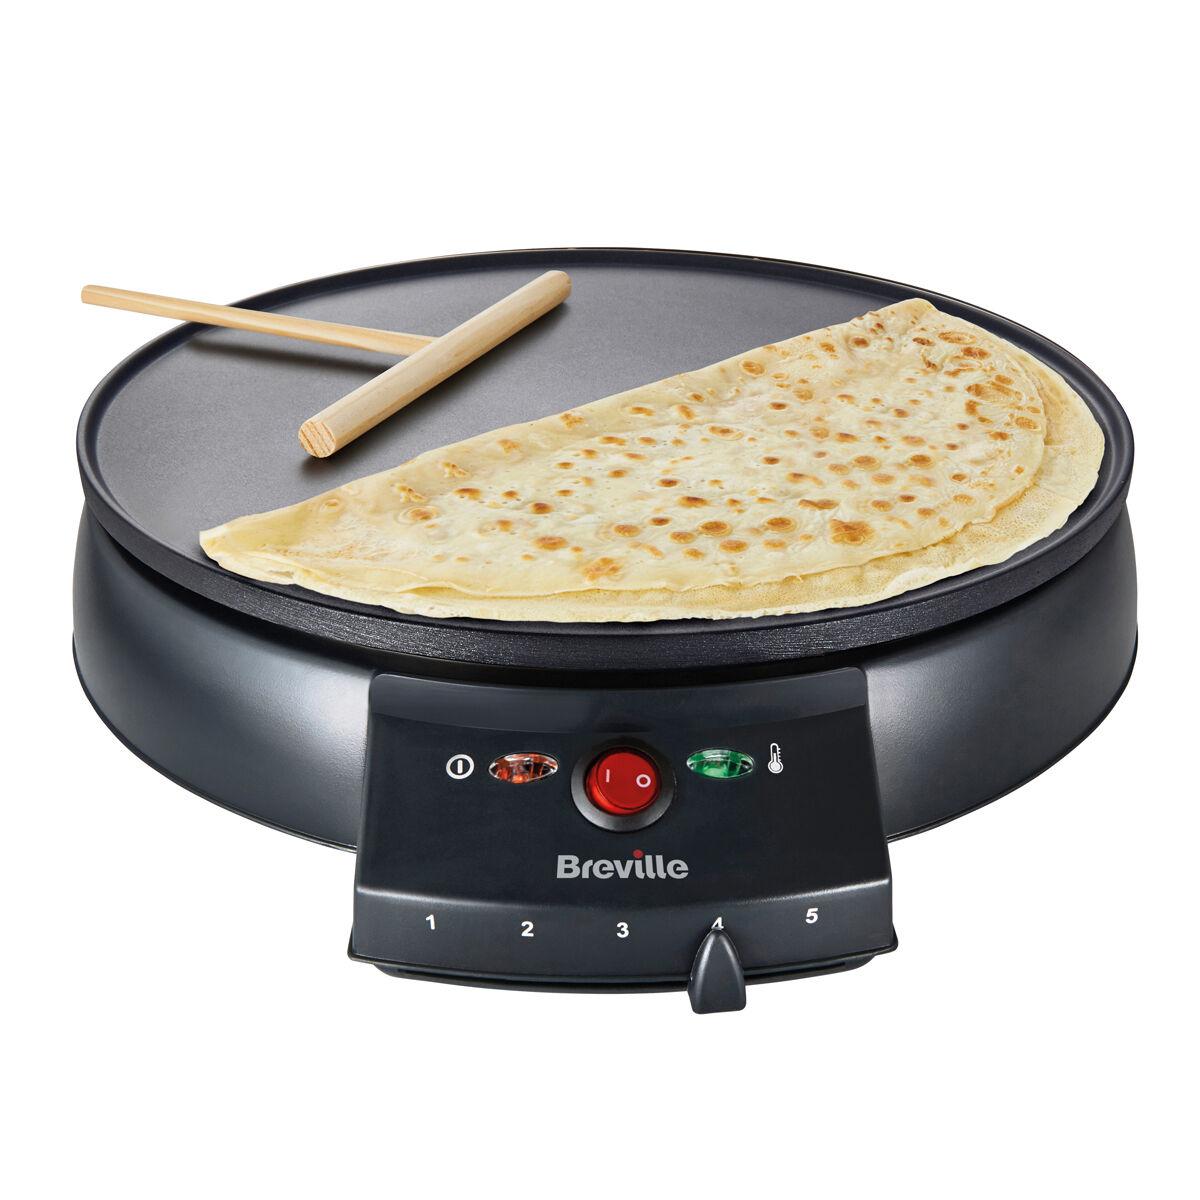 Pancake maker review